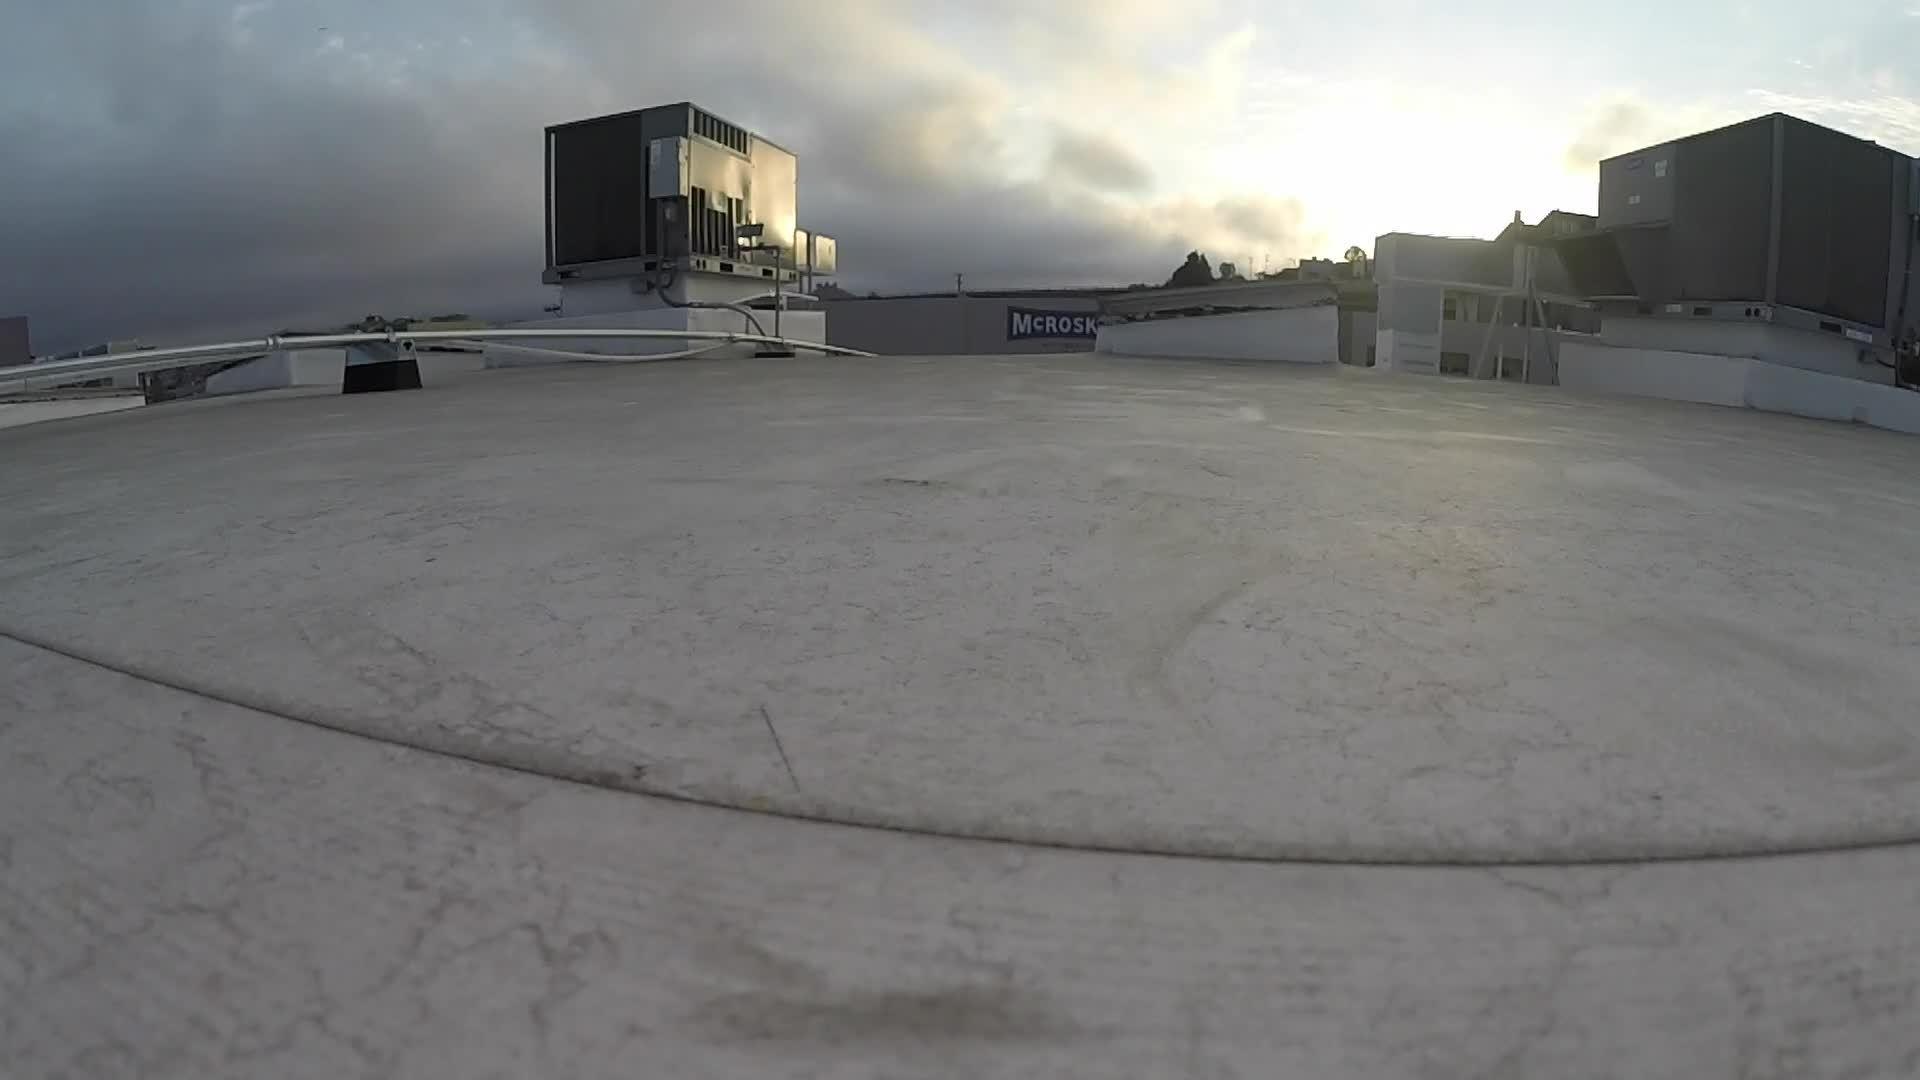 dogpatch, drone, drone footage, drones, san francisco, Drone footage from San Francisco in Dogpatch #1 GIFs